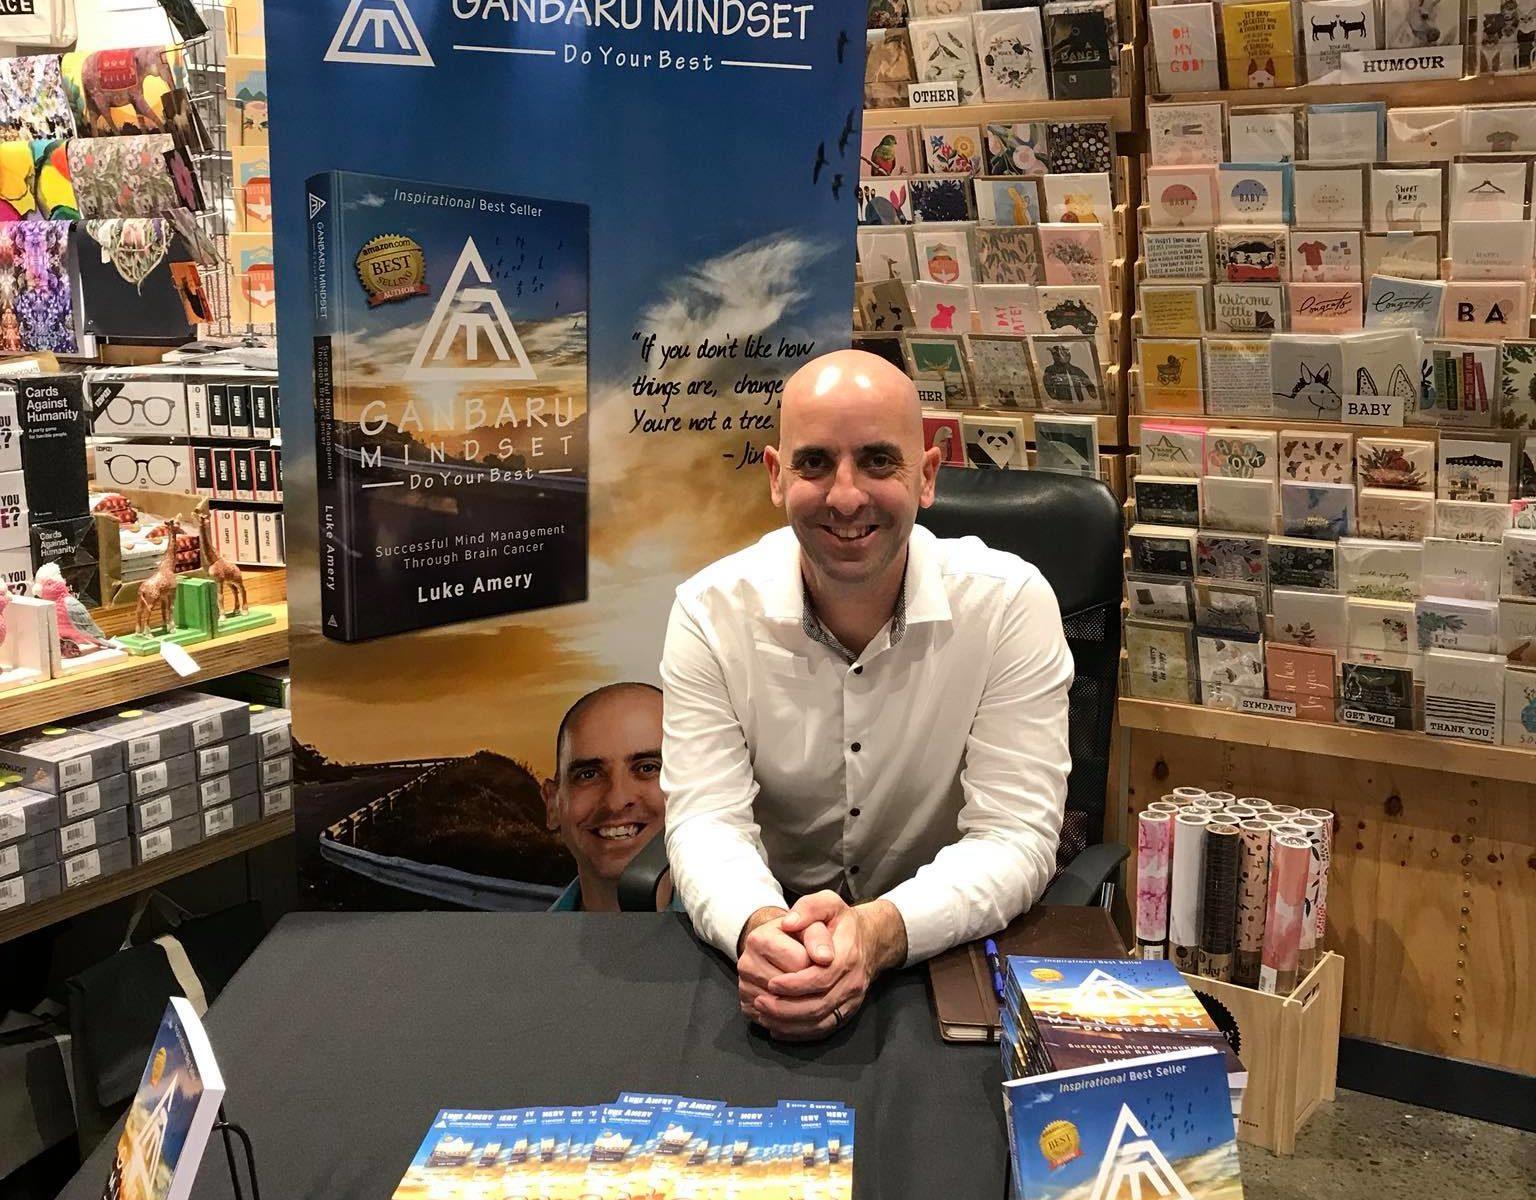 "Luke Amery, Author ""Ganbaru Mindset"""